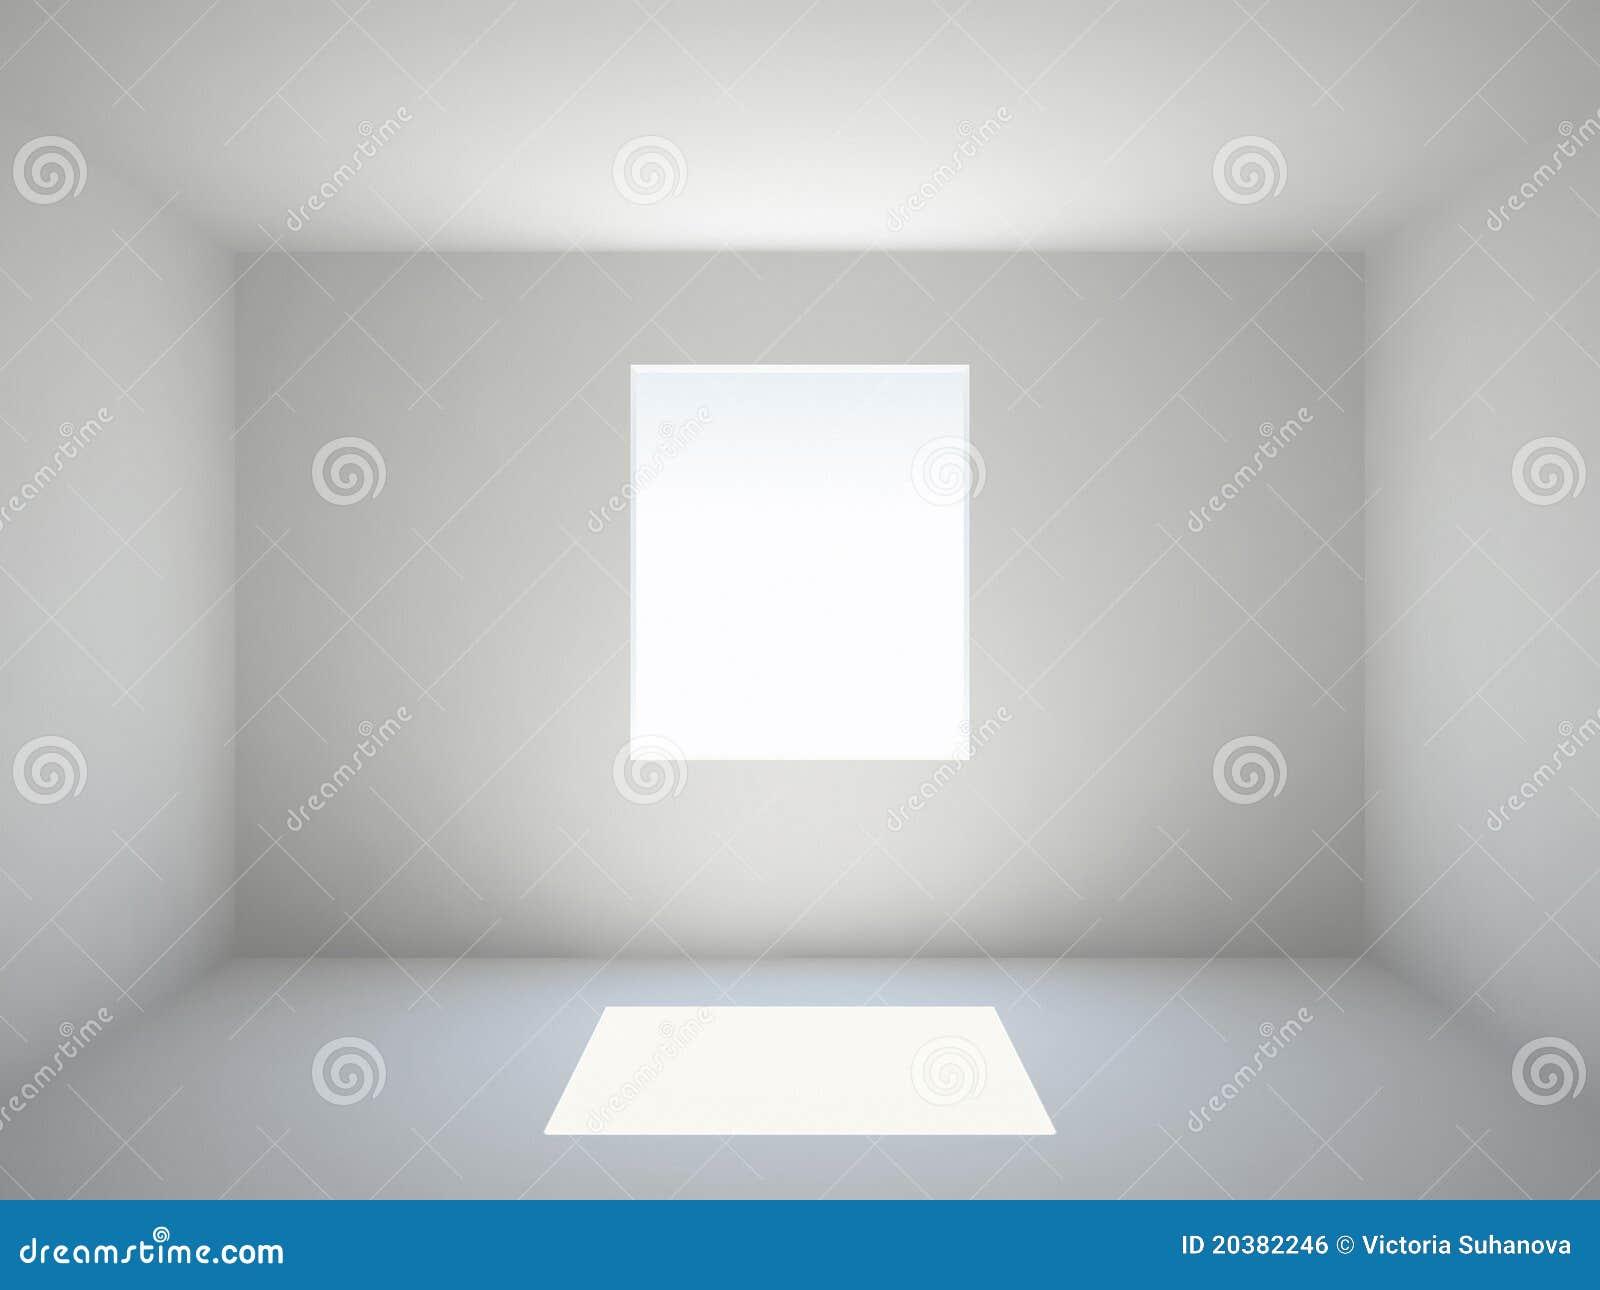 leerer raum mit fenster lizenzfreies stockbild bild 20382246. Black Bedroom Furniture Sets. Home Design Ideas